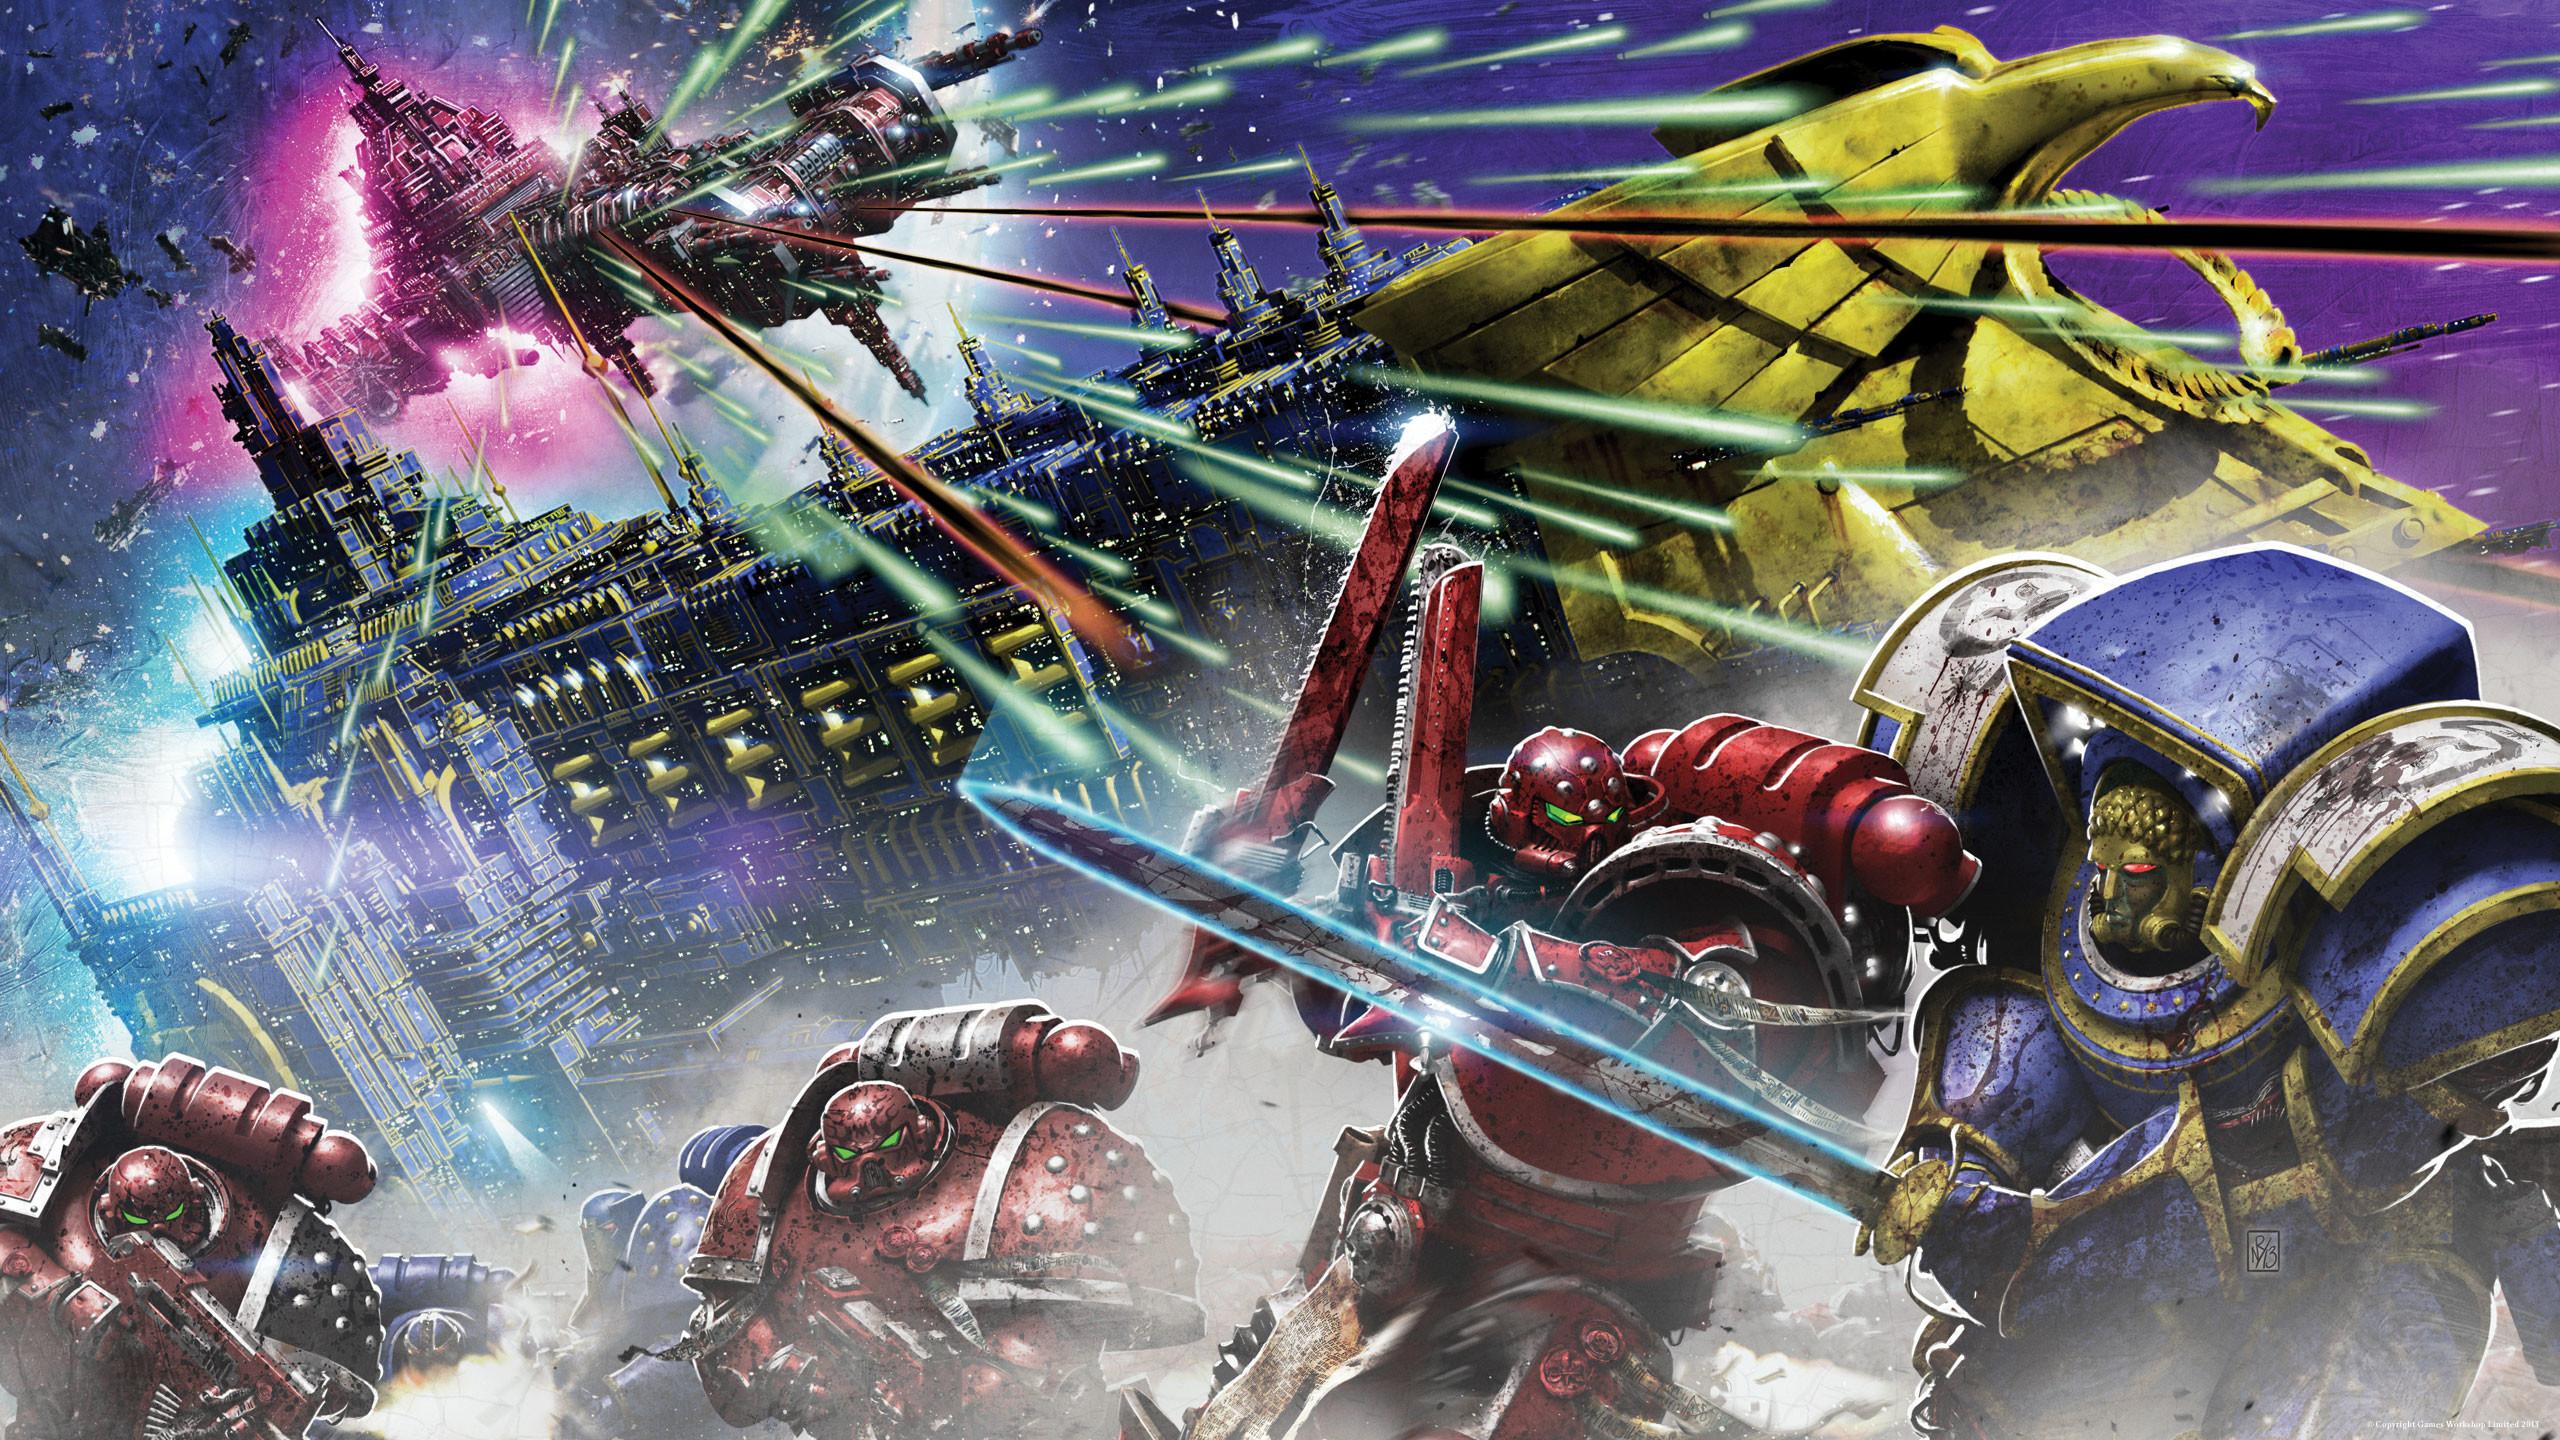 macragges-honor-wallpaper.jpg (2560×1440) | 10K: Imperial Fleet | Pinterest  | Warhammer 40K, Warhammer 40k and Space marine